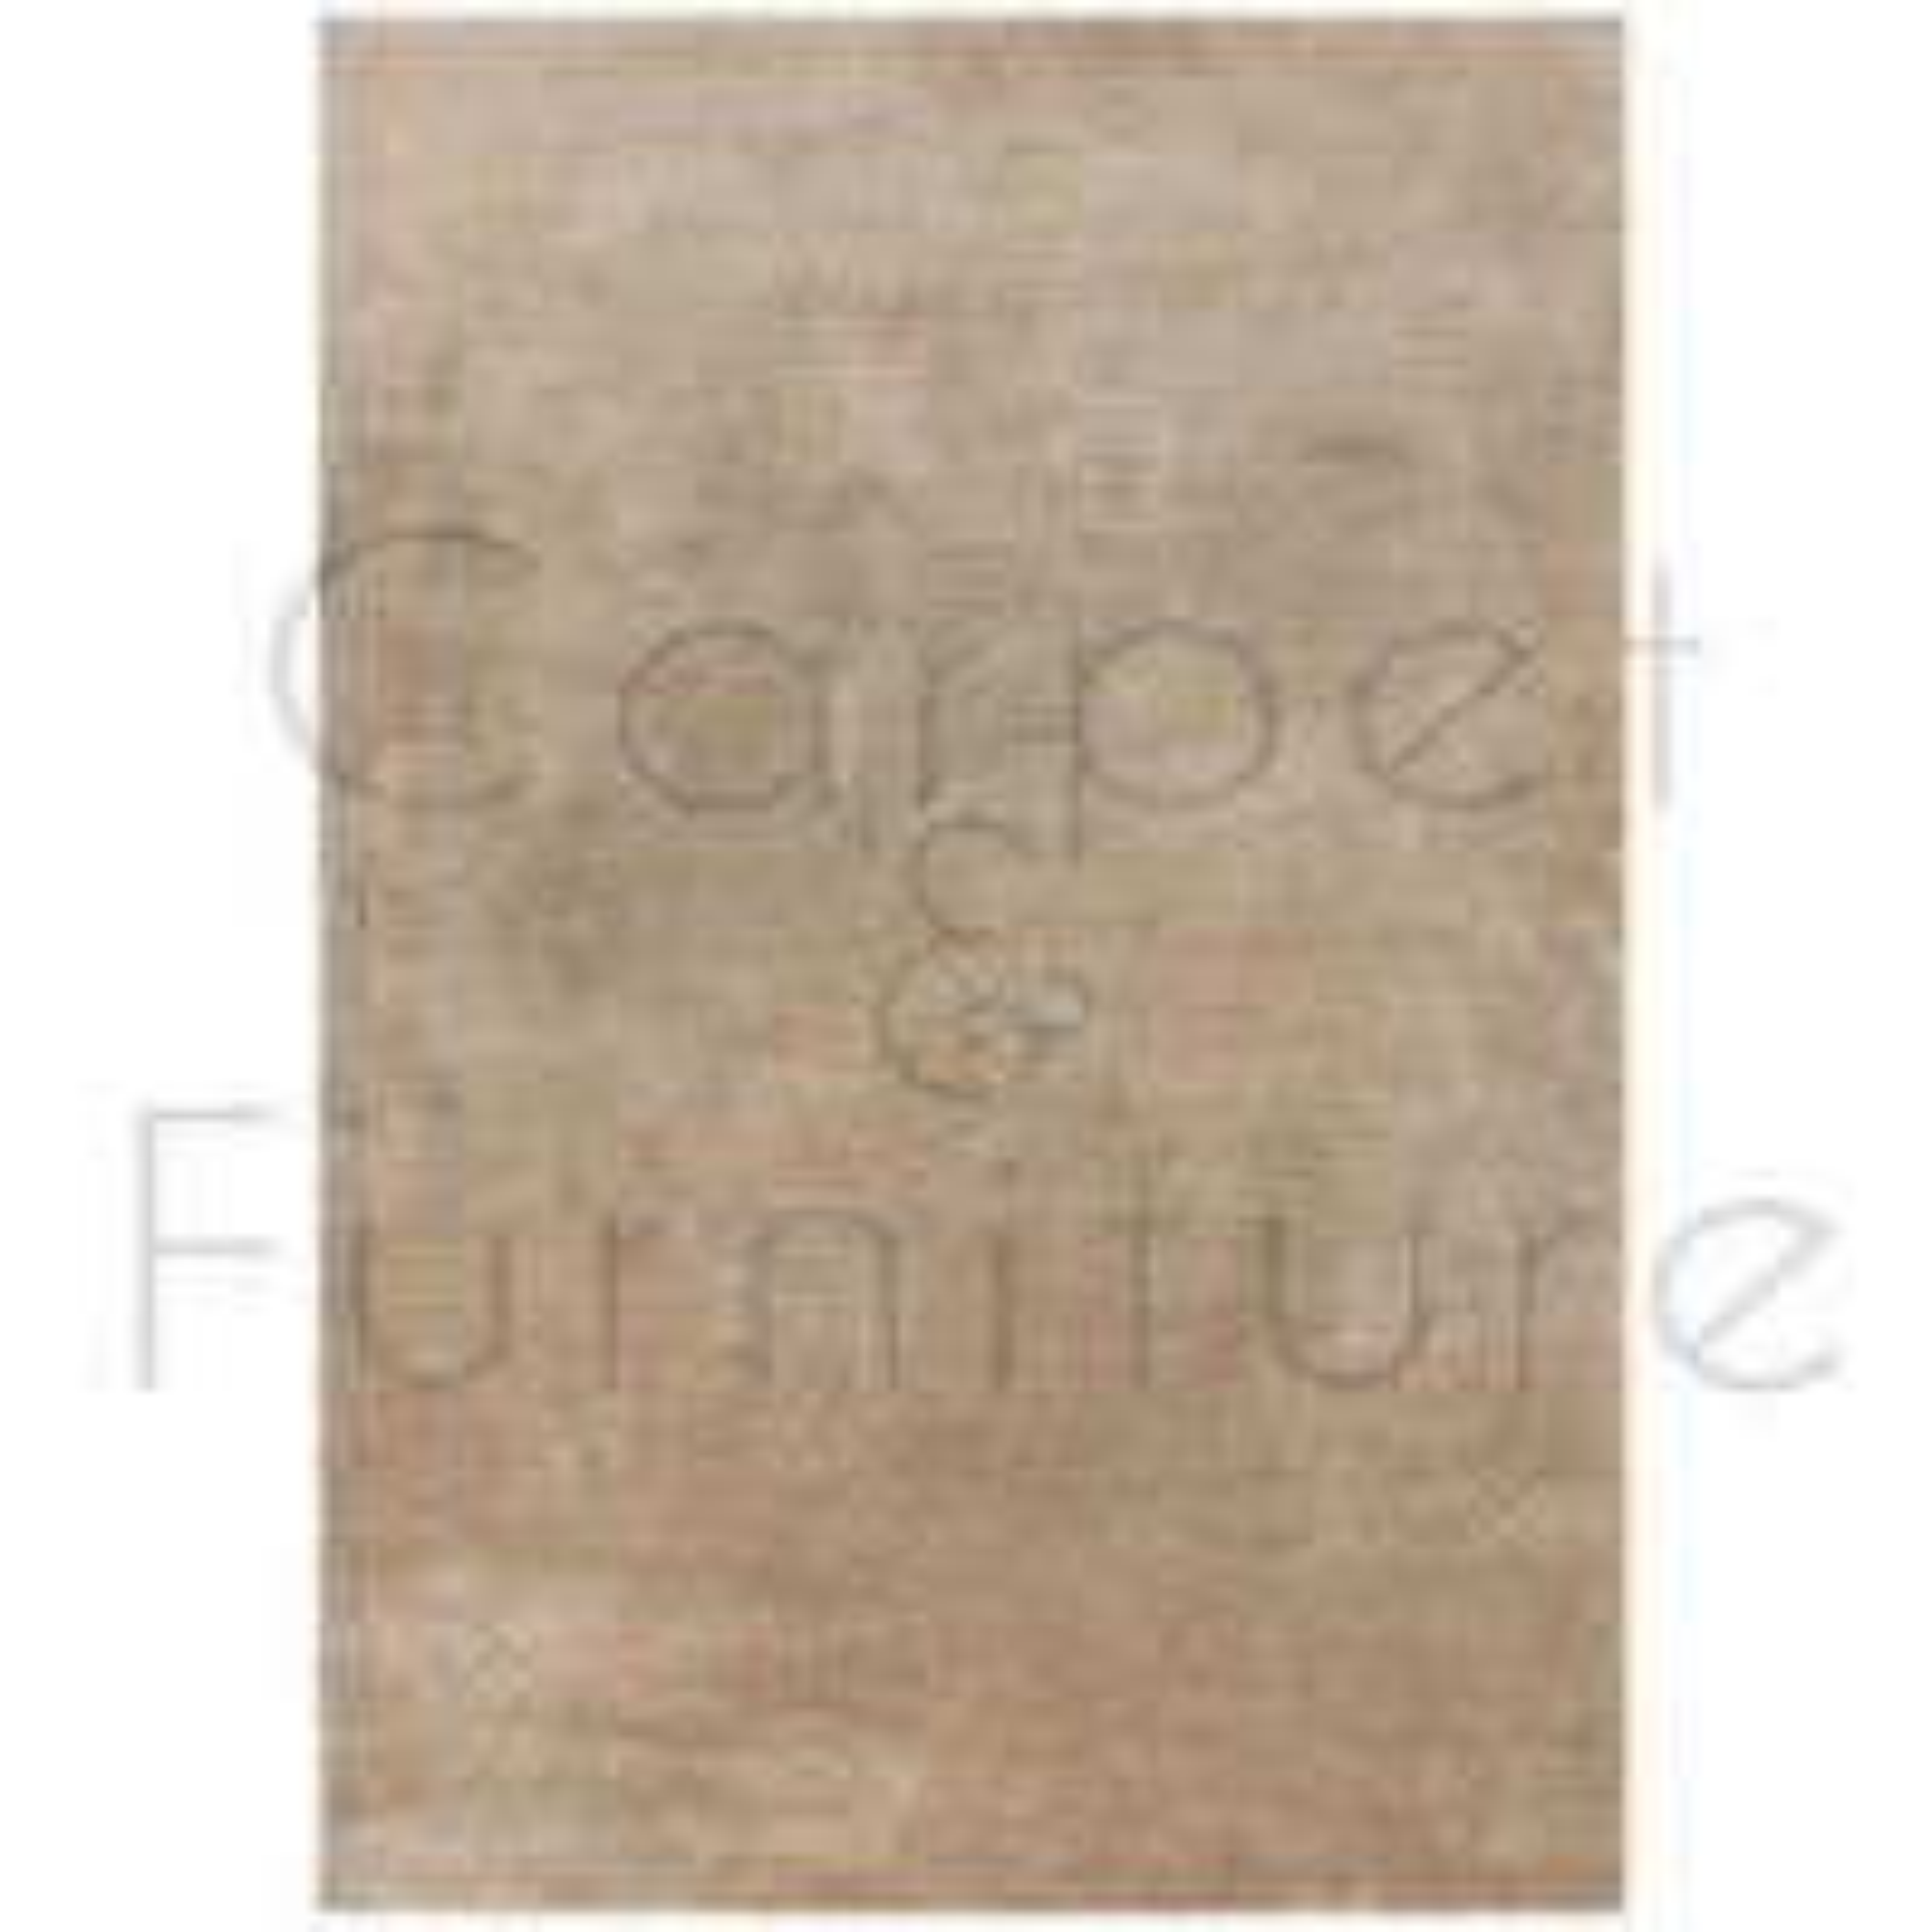 "Milo Soft Plain Rug - Sand - Size 120 x 170 cm (4' x 5'7"")"